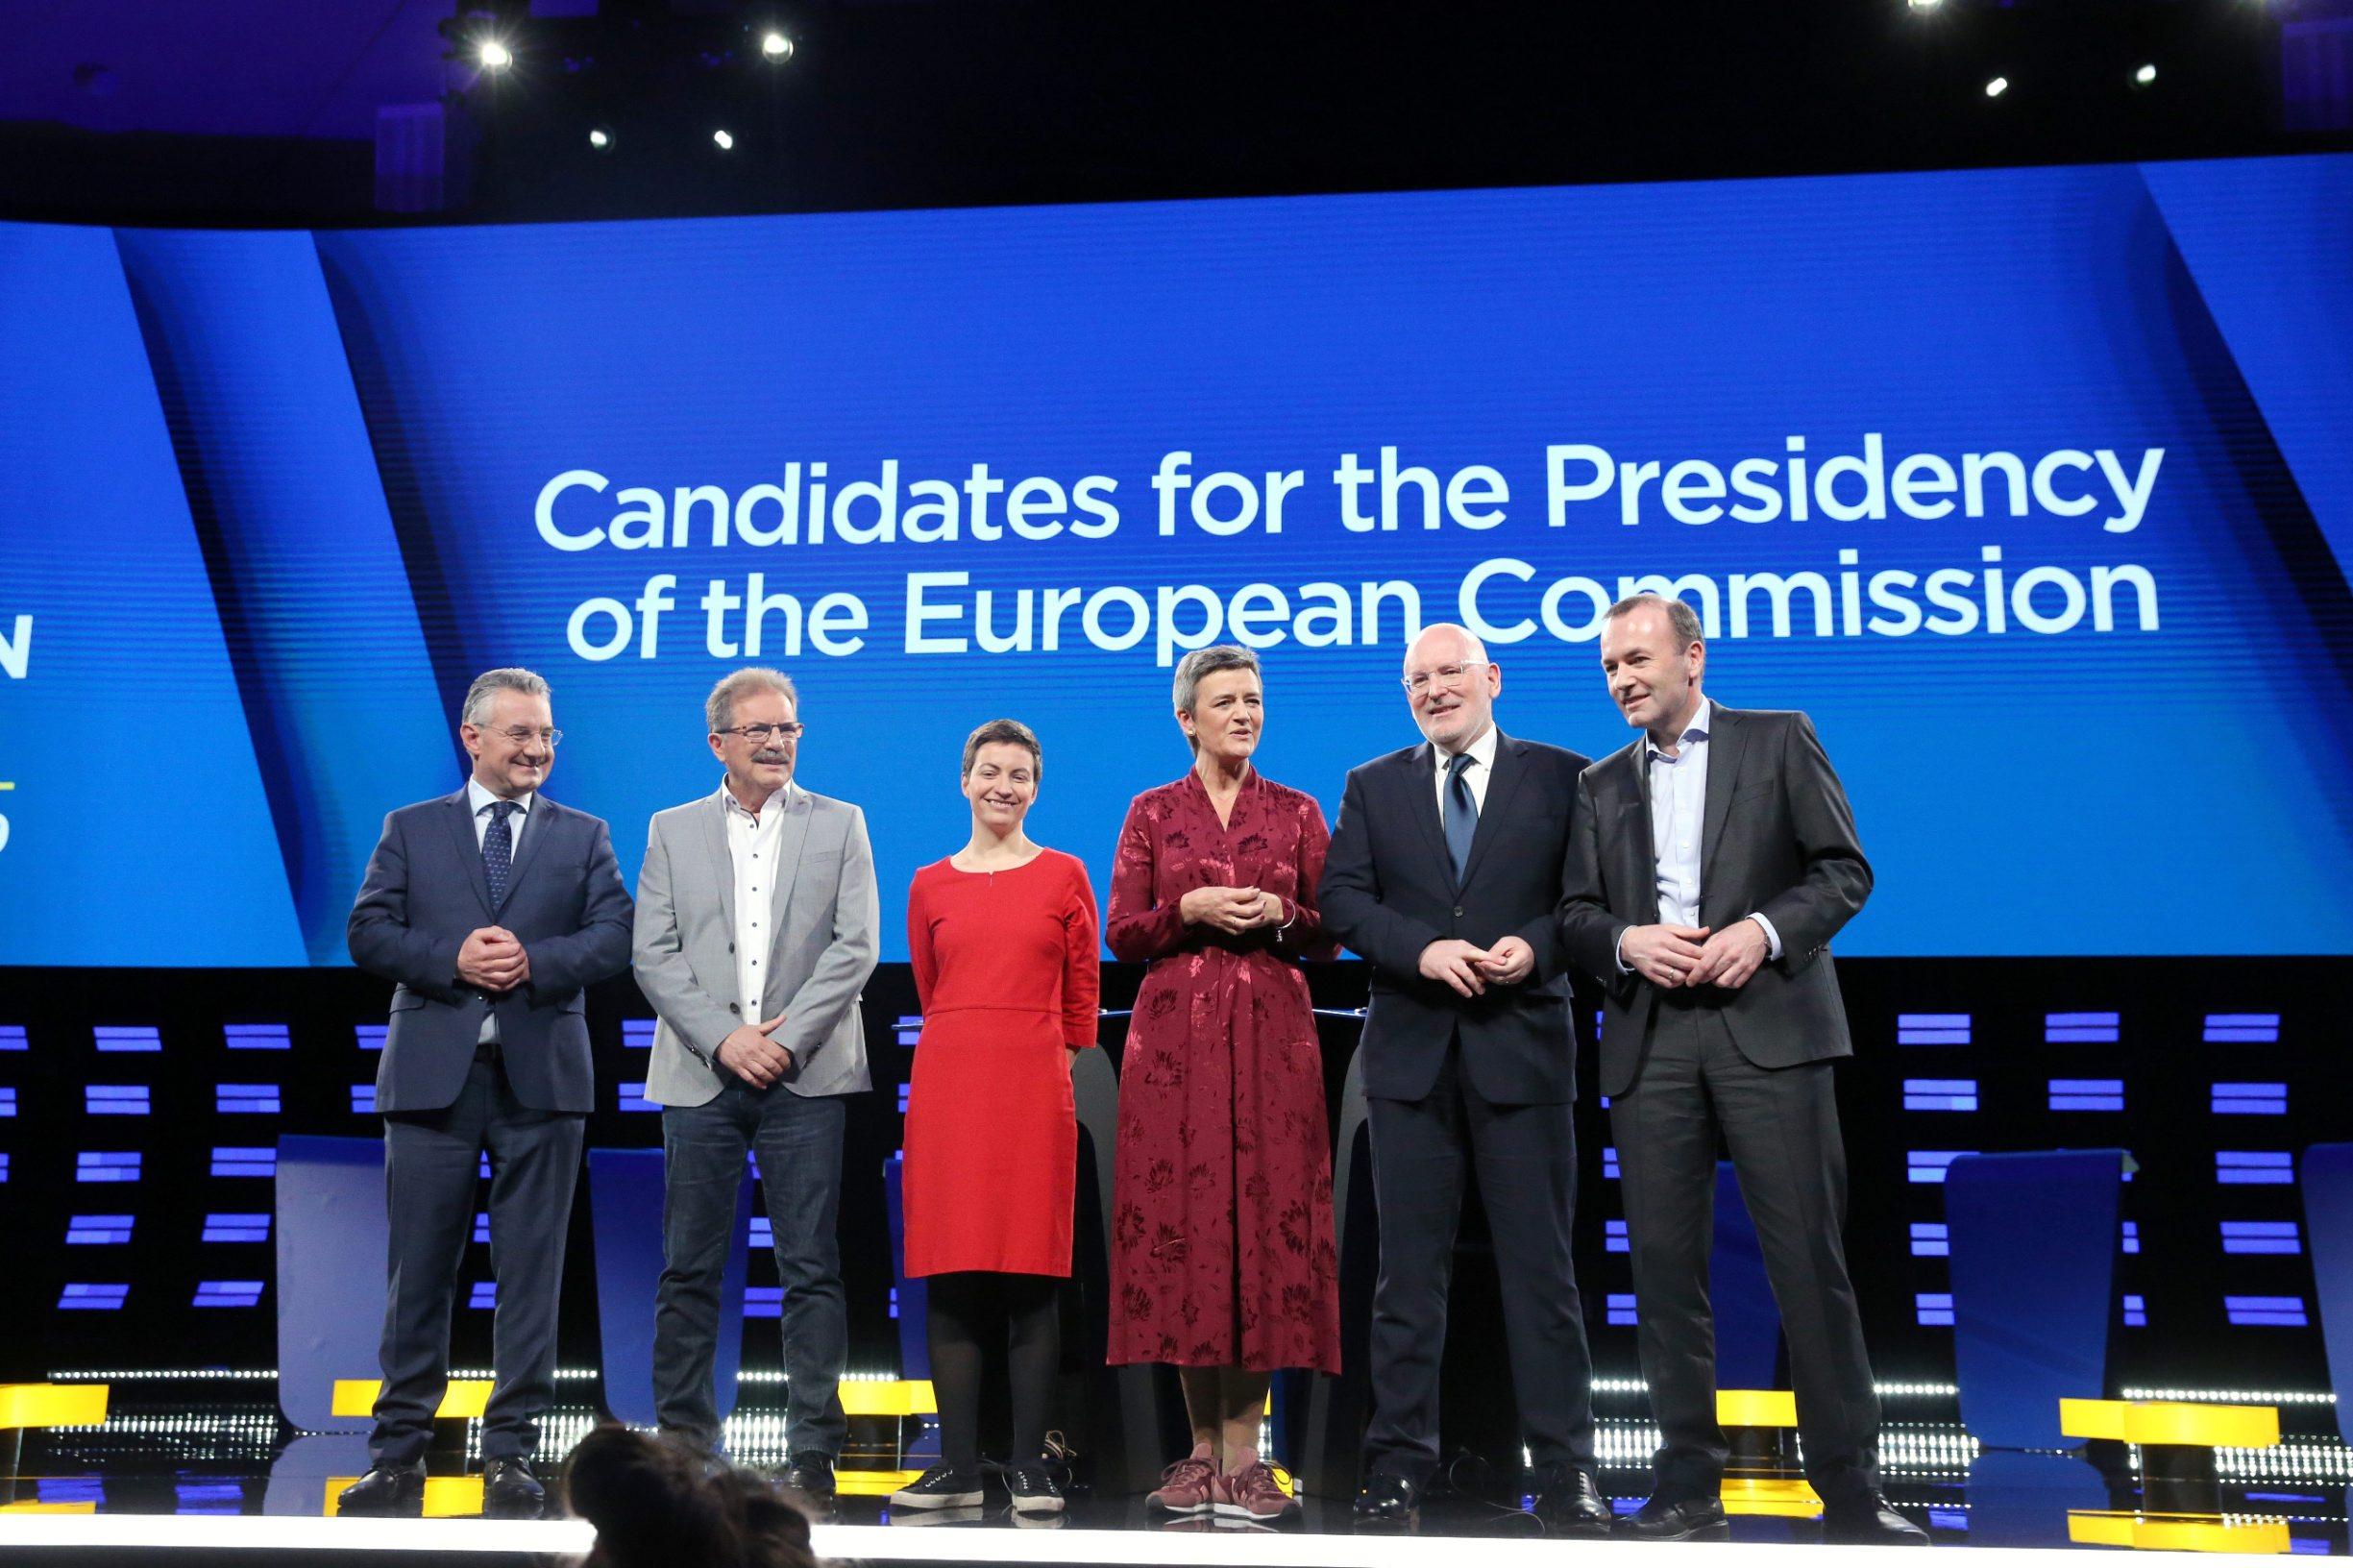 Jan Zahradil (ECR), Nico Cue (GUE), Ska Keller (Zeleni), Margrethe Vestager (ALDE), Frans Timmermans (S&D) i Manfred Weber (EPP)